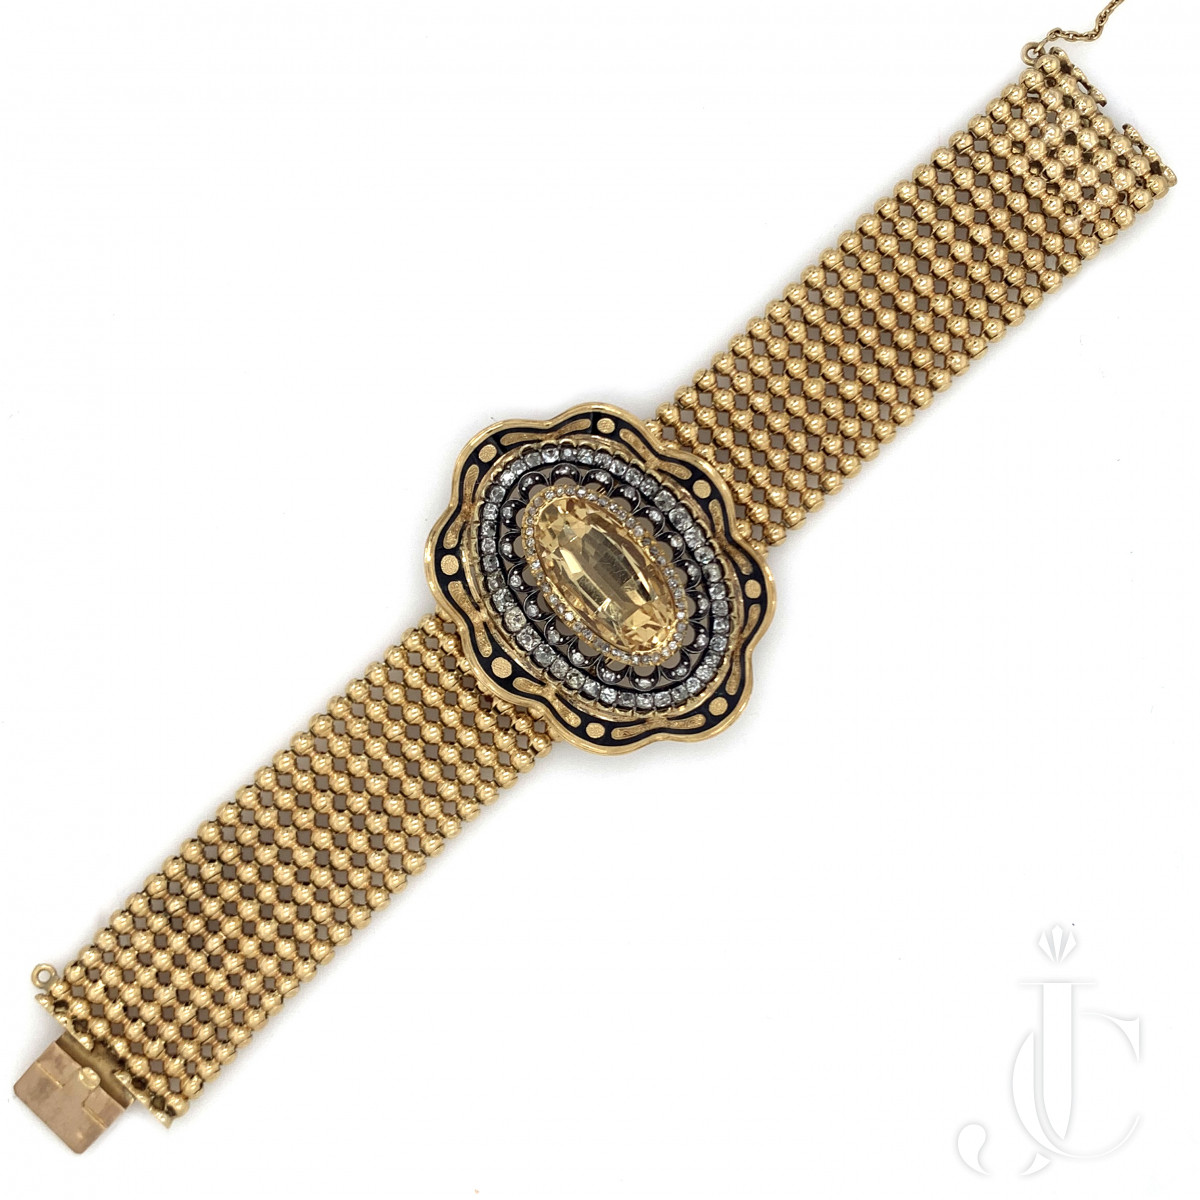 Antique French 18kt yg Citrine Bracelet